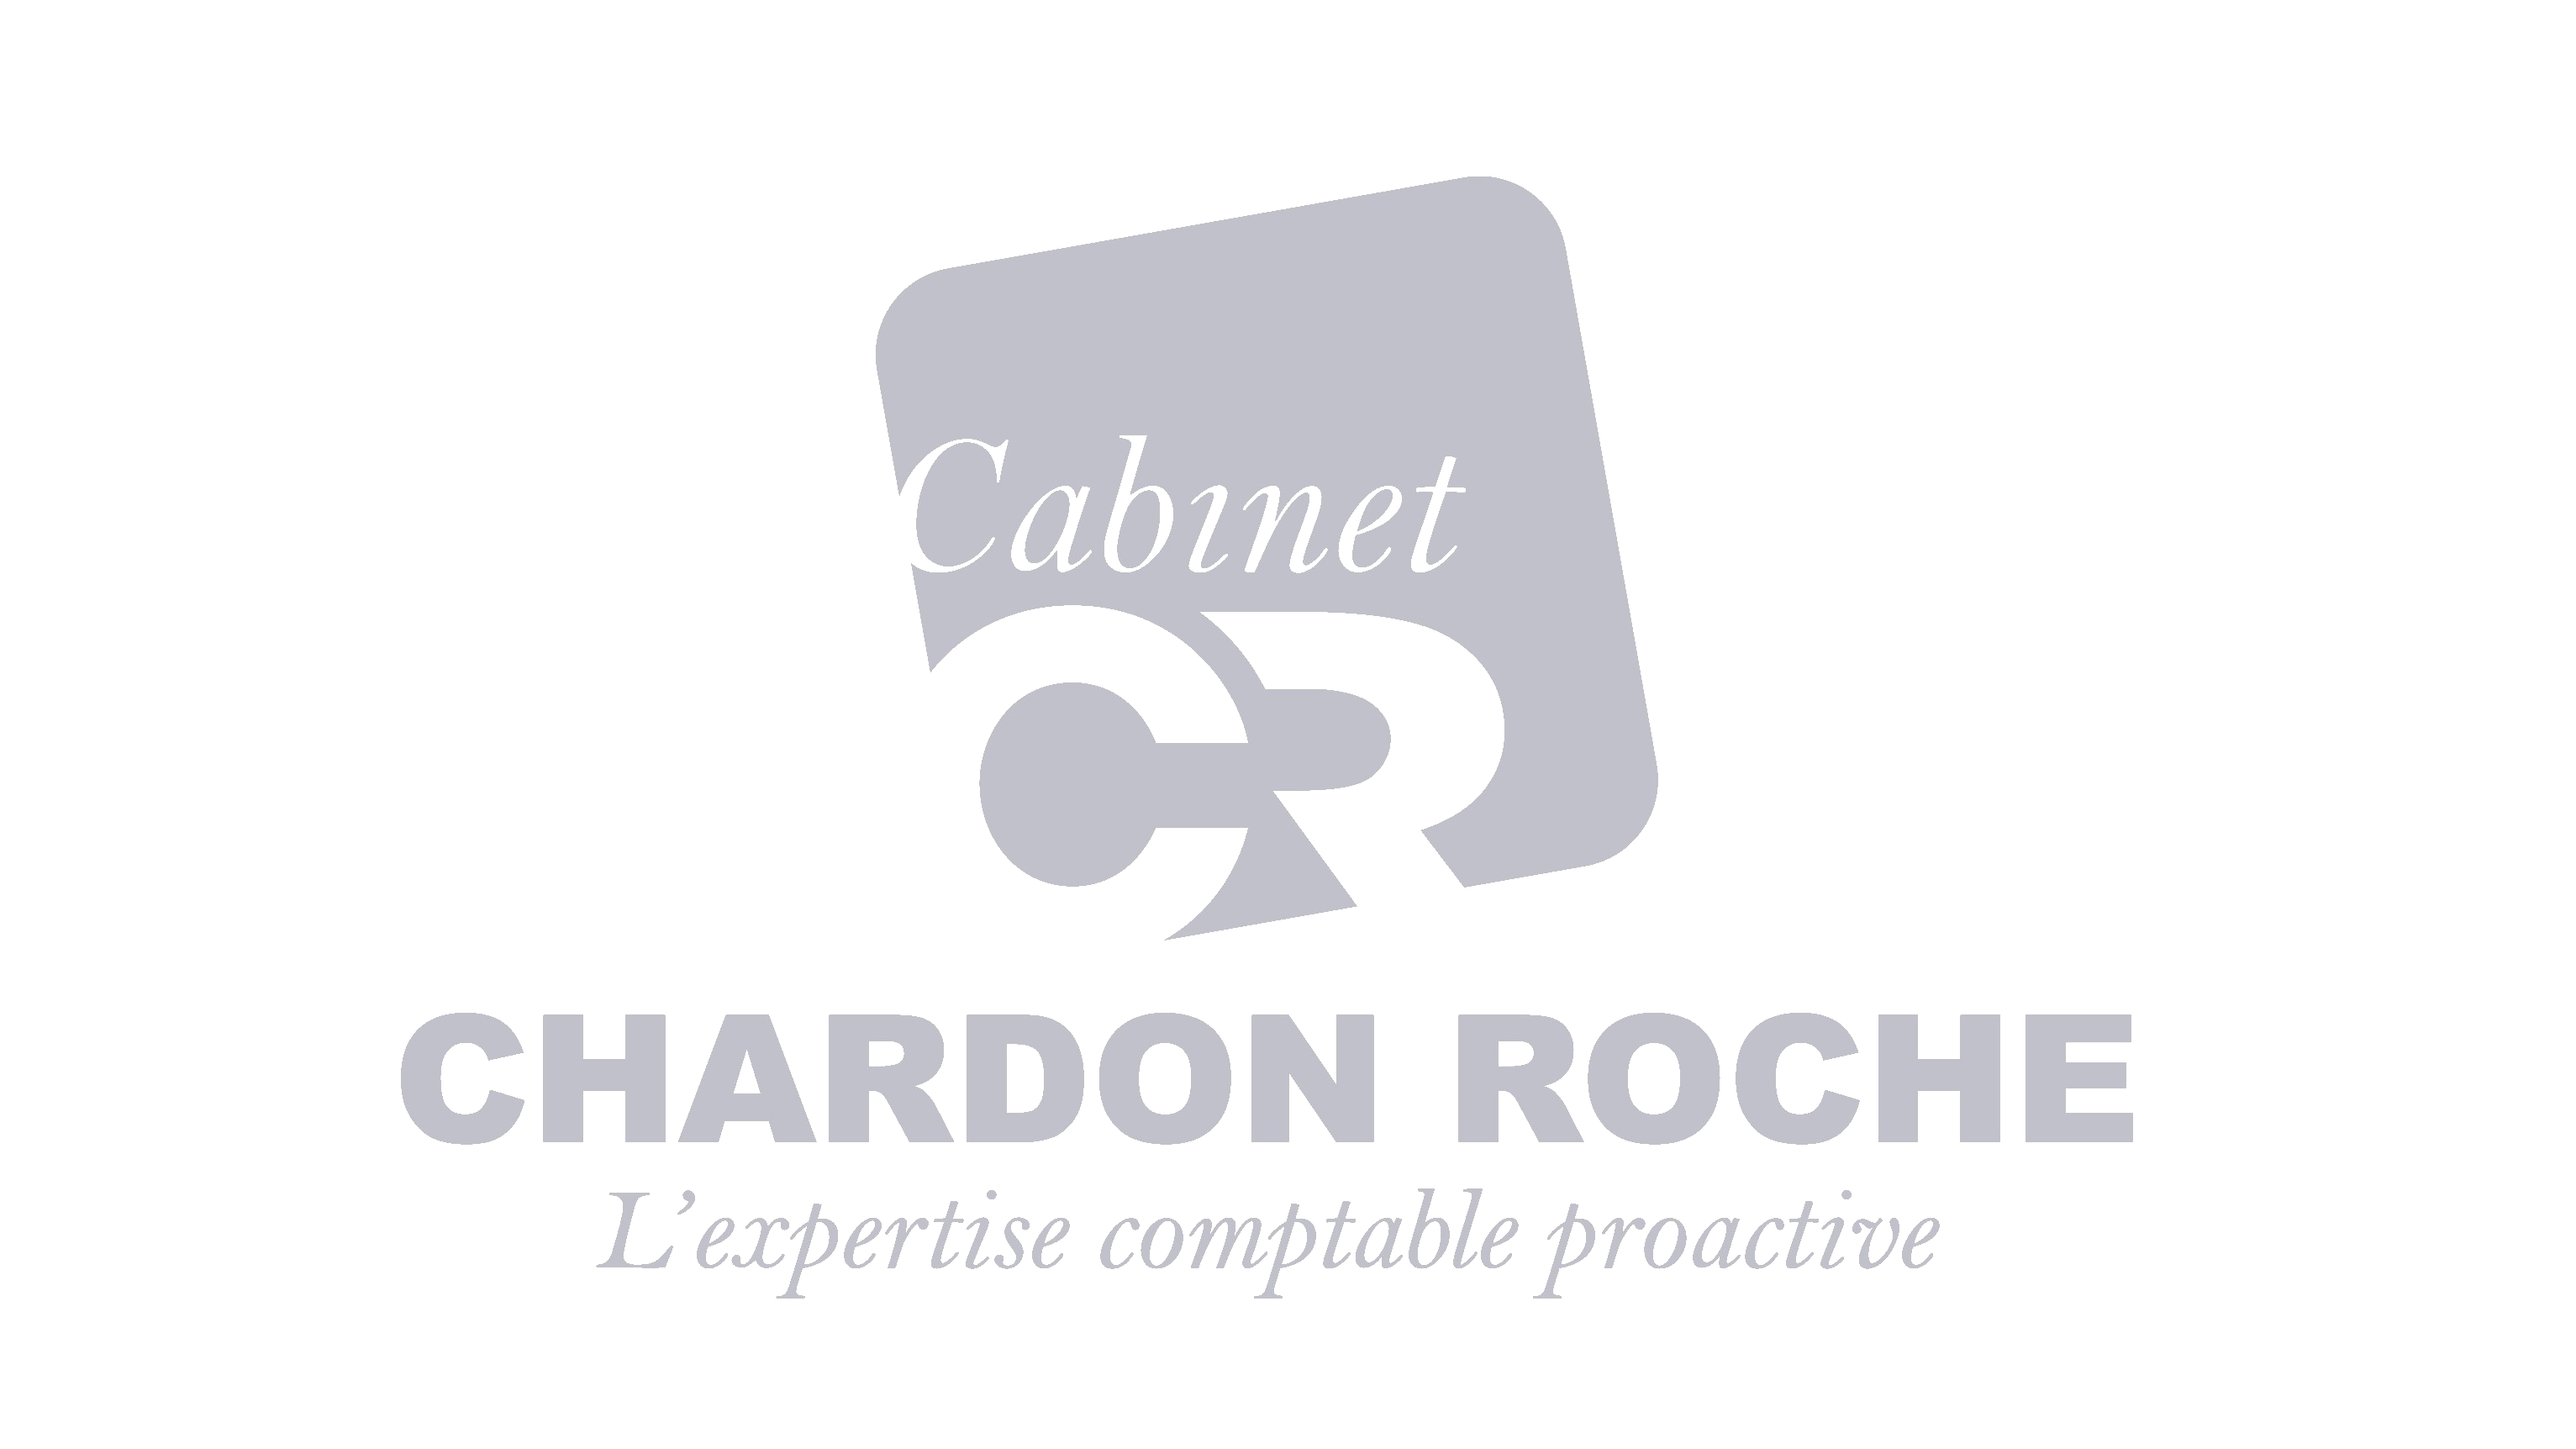 Chardon Roche